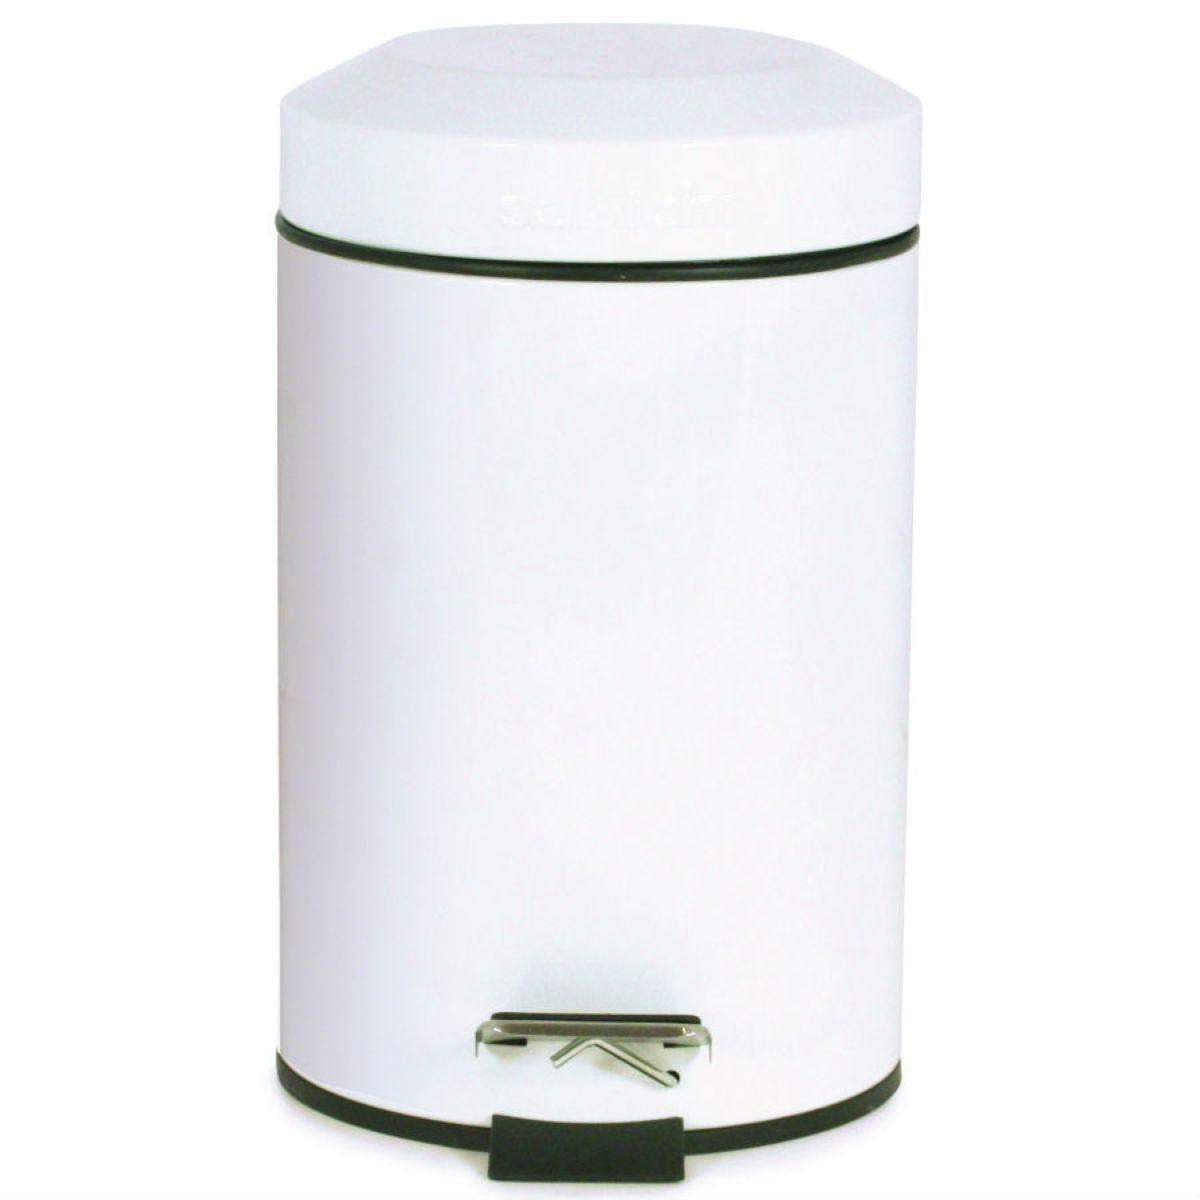 Sabichi 3L Stainless Steel Small Pedal Bin - White